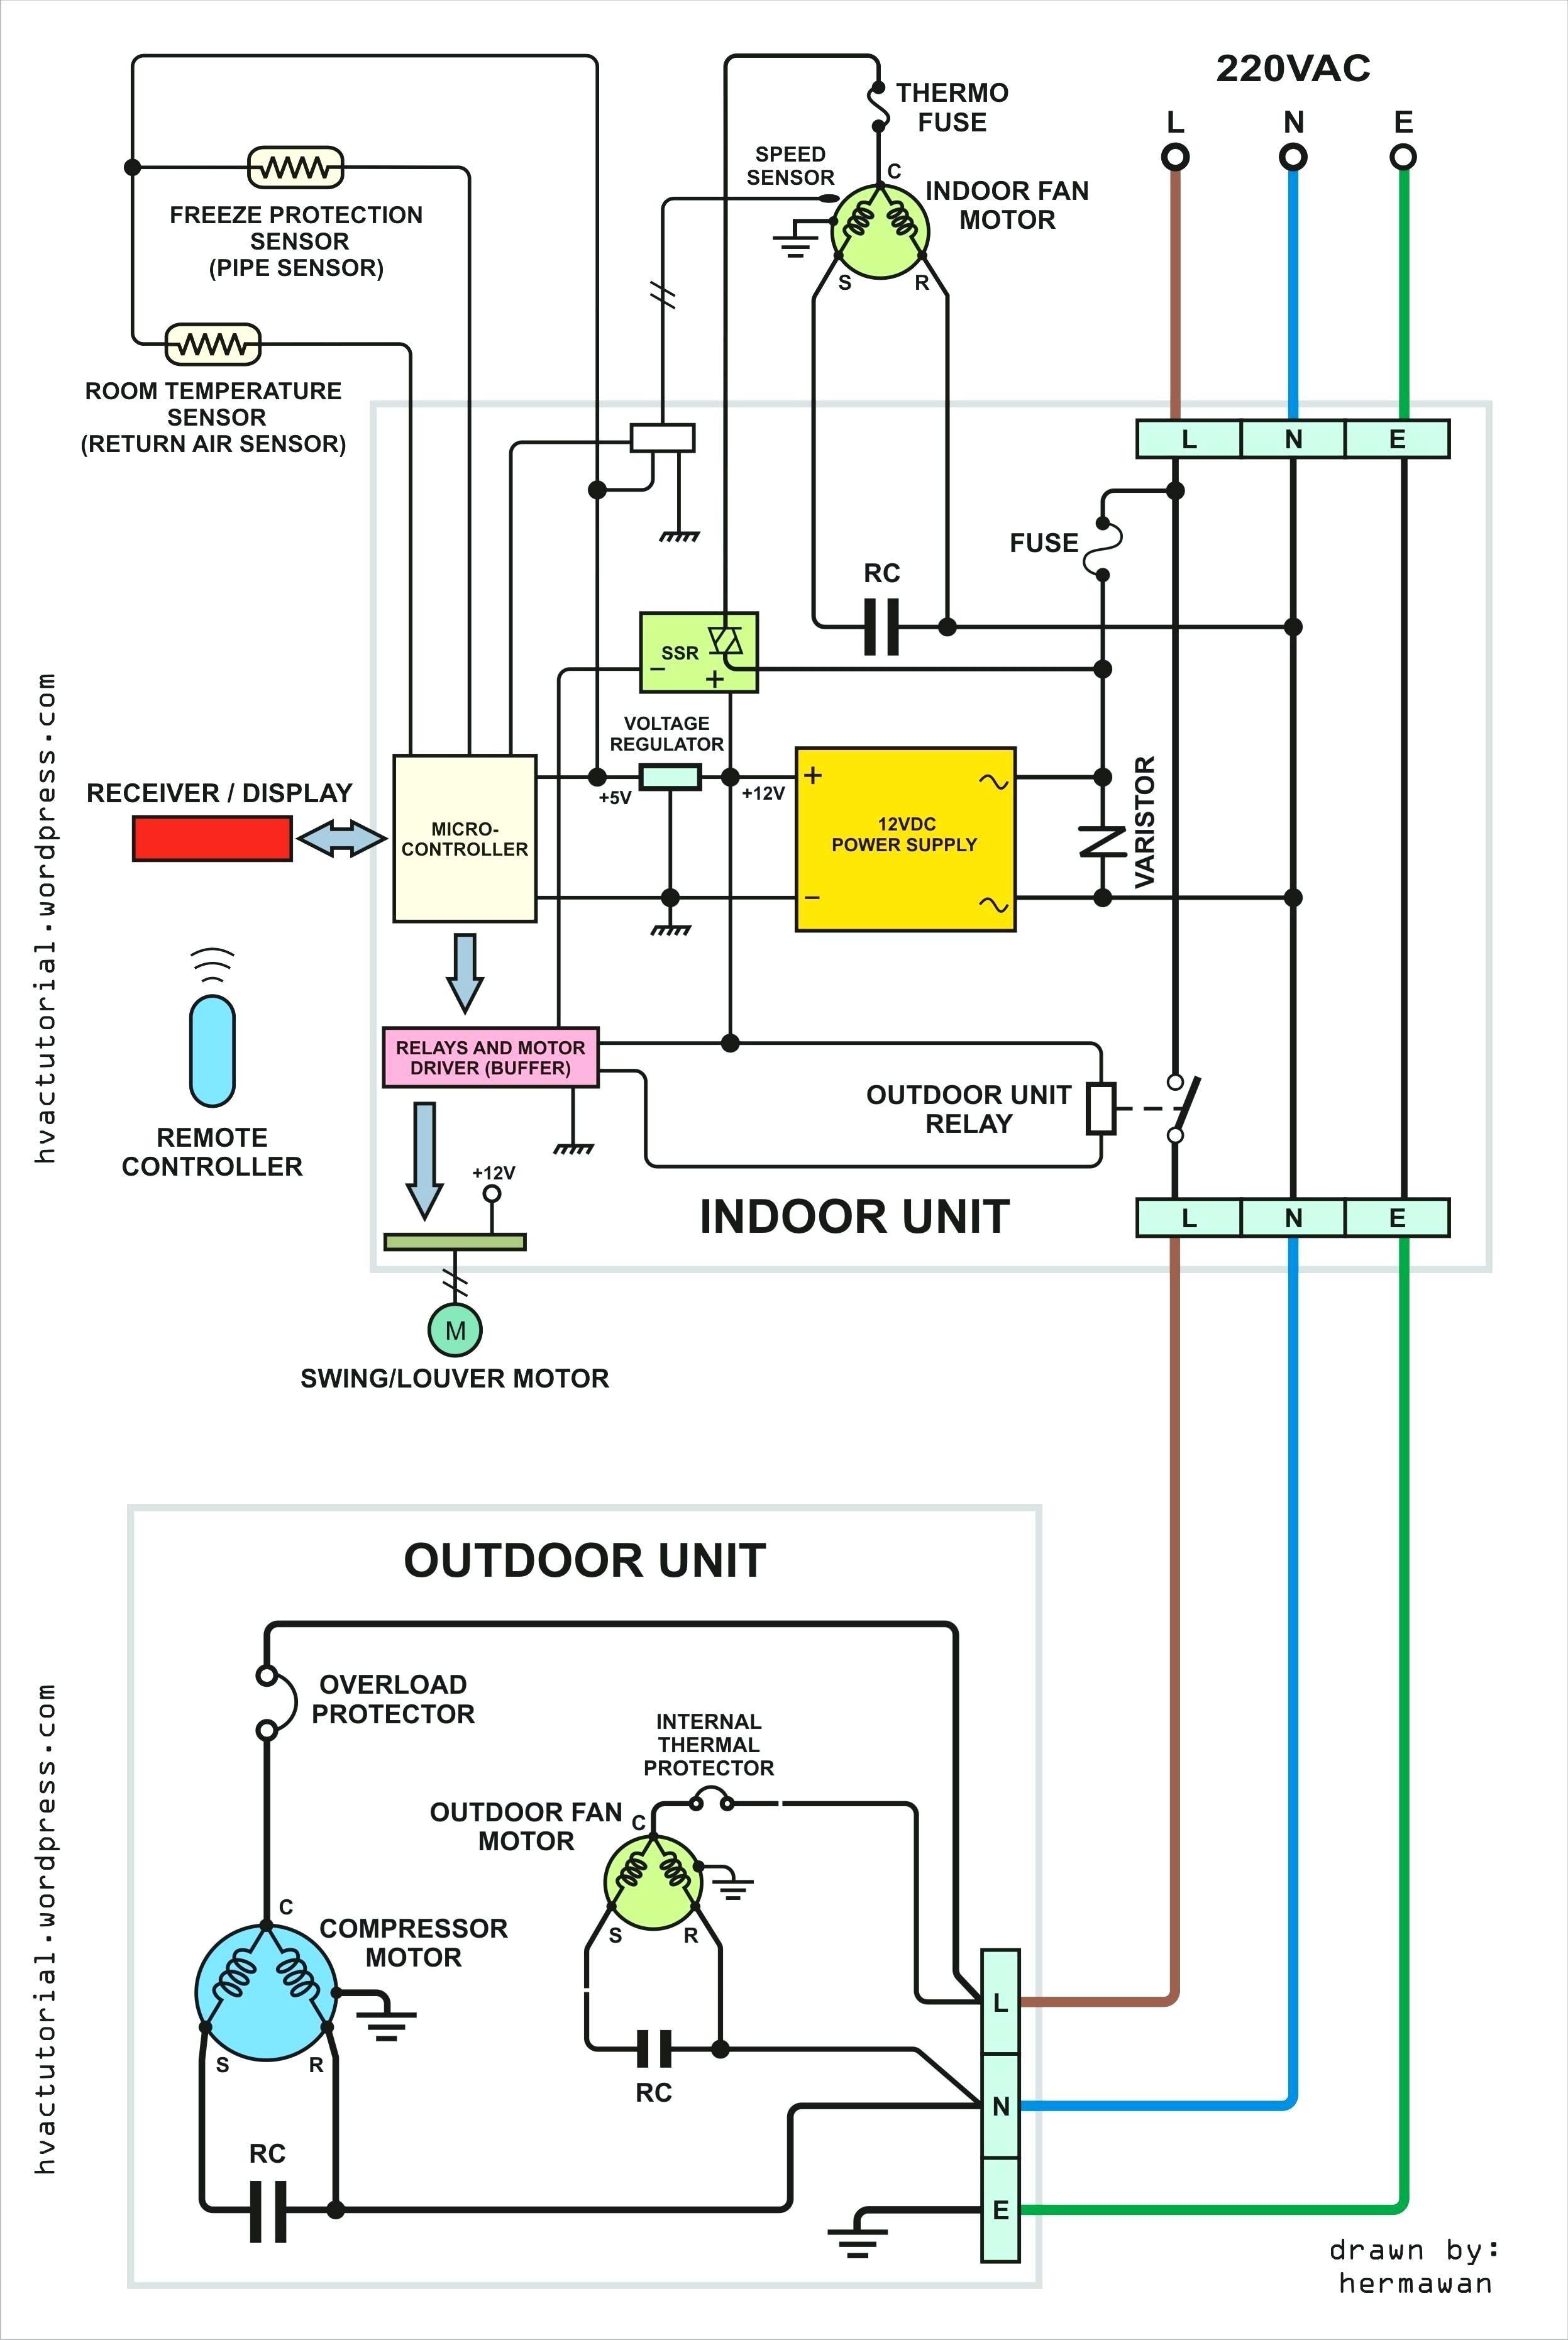 Capacitor Contactor Wiring Diagram